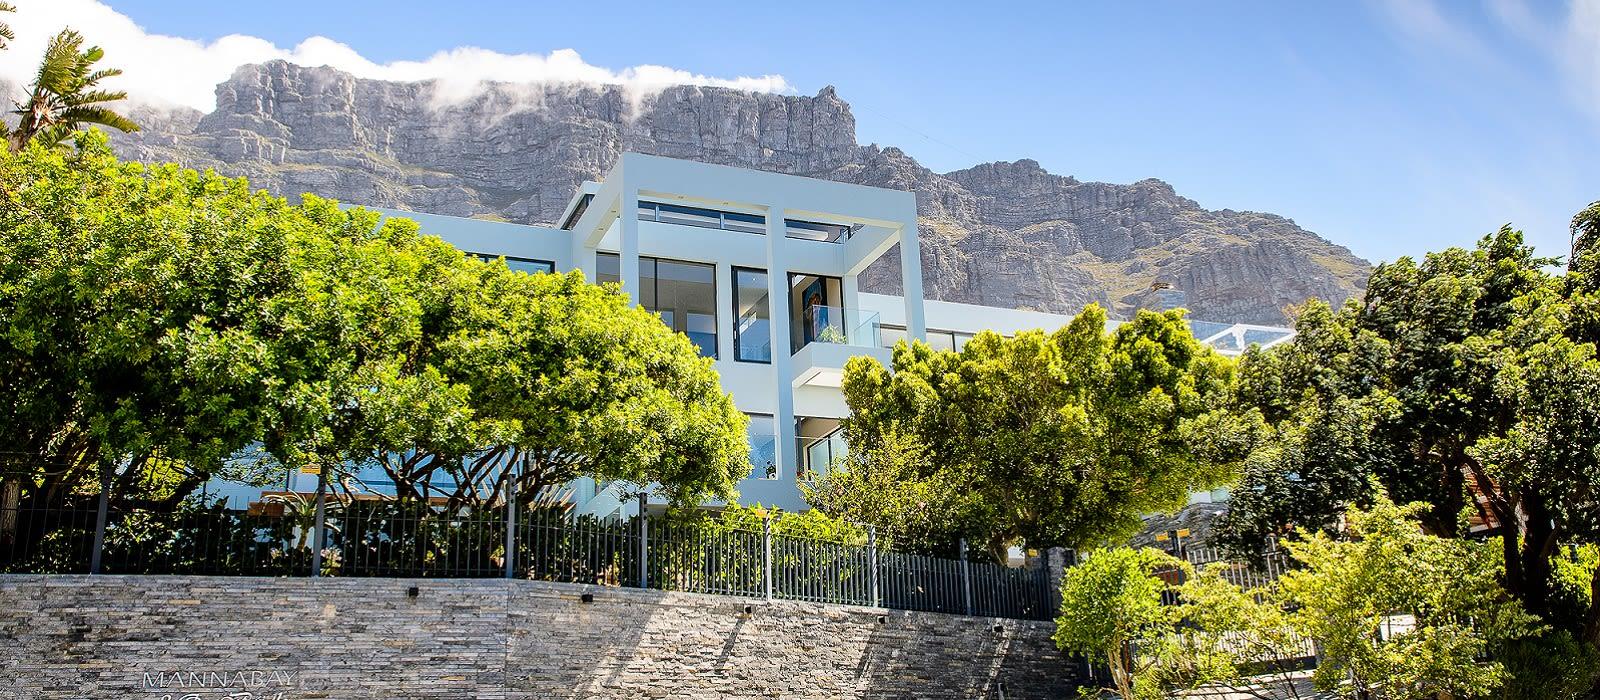 Hotel Manna Bay South Africa